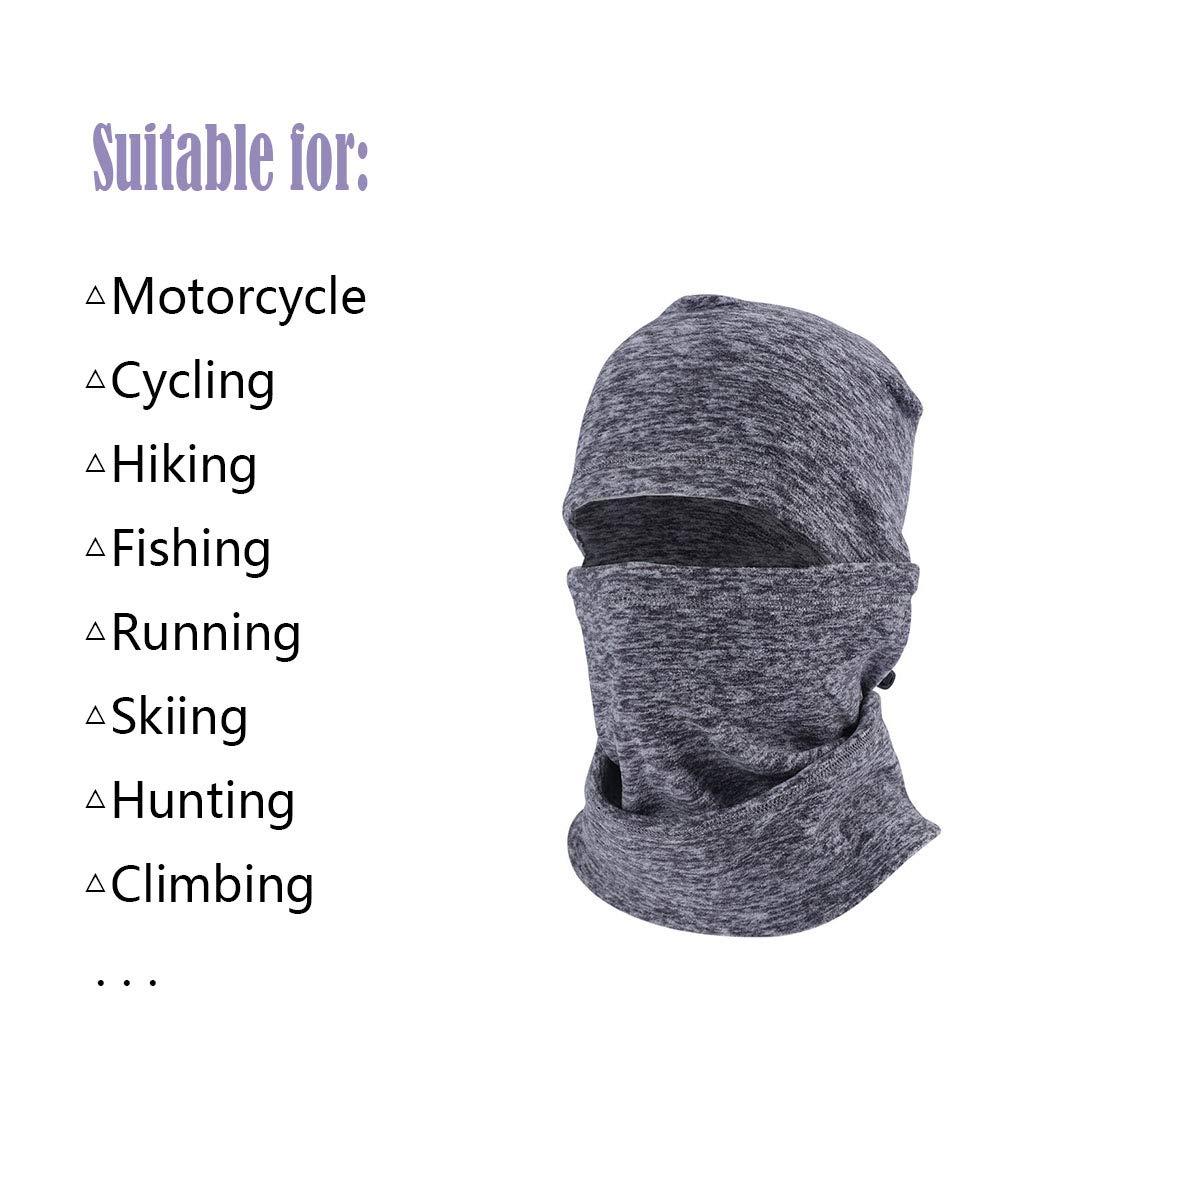 DDDW Motorcycle Full Face Mask Velcro Winter Warm Windproof Ski Balaclava Breathable Riding Headwear